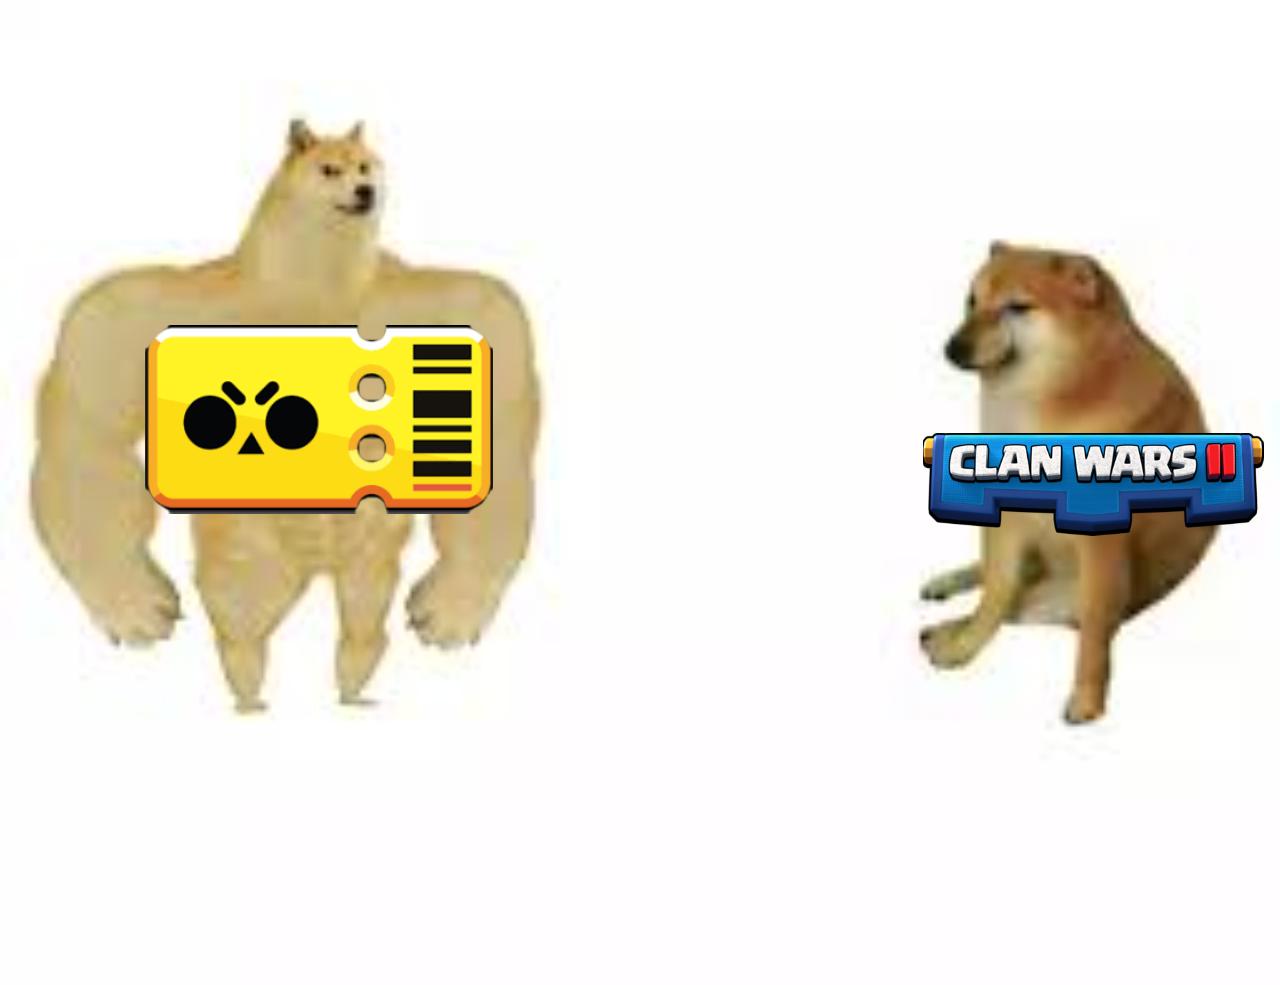 El meme de Brawl Stars vs Clash Royale